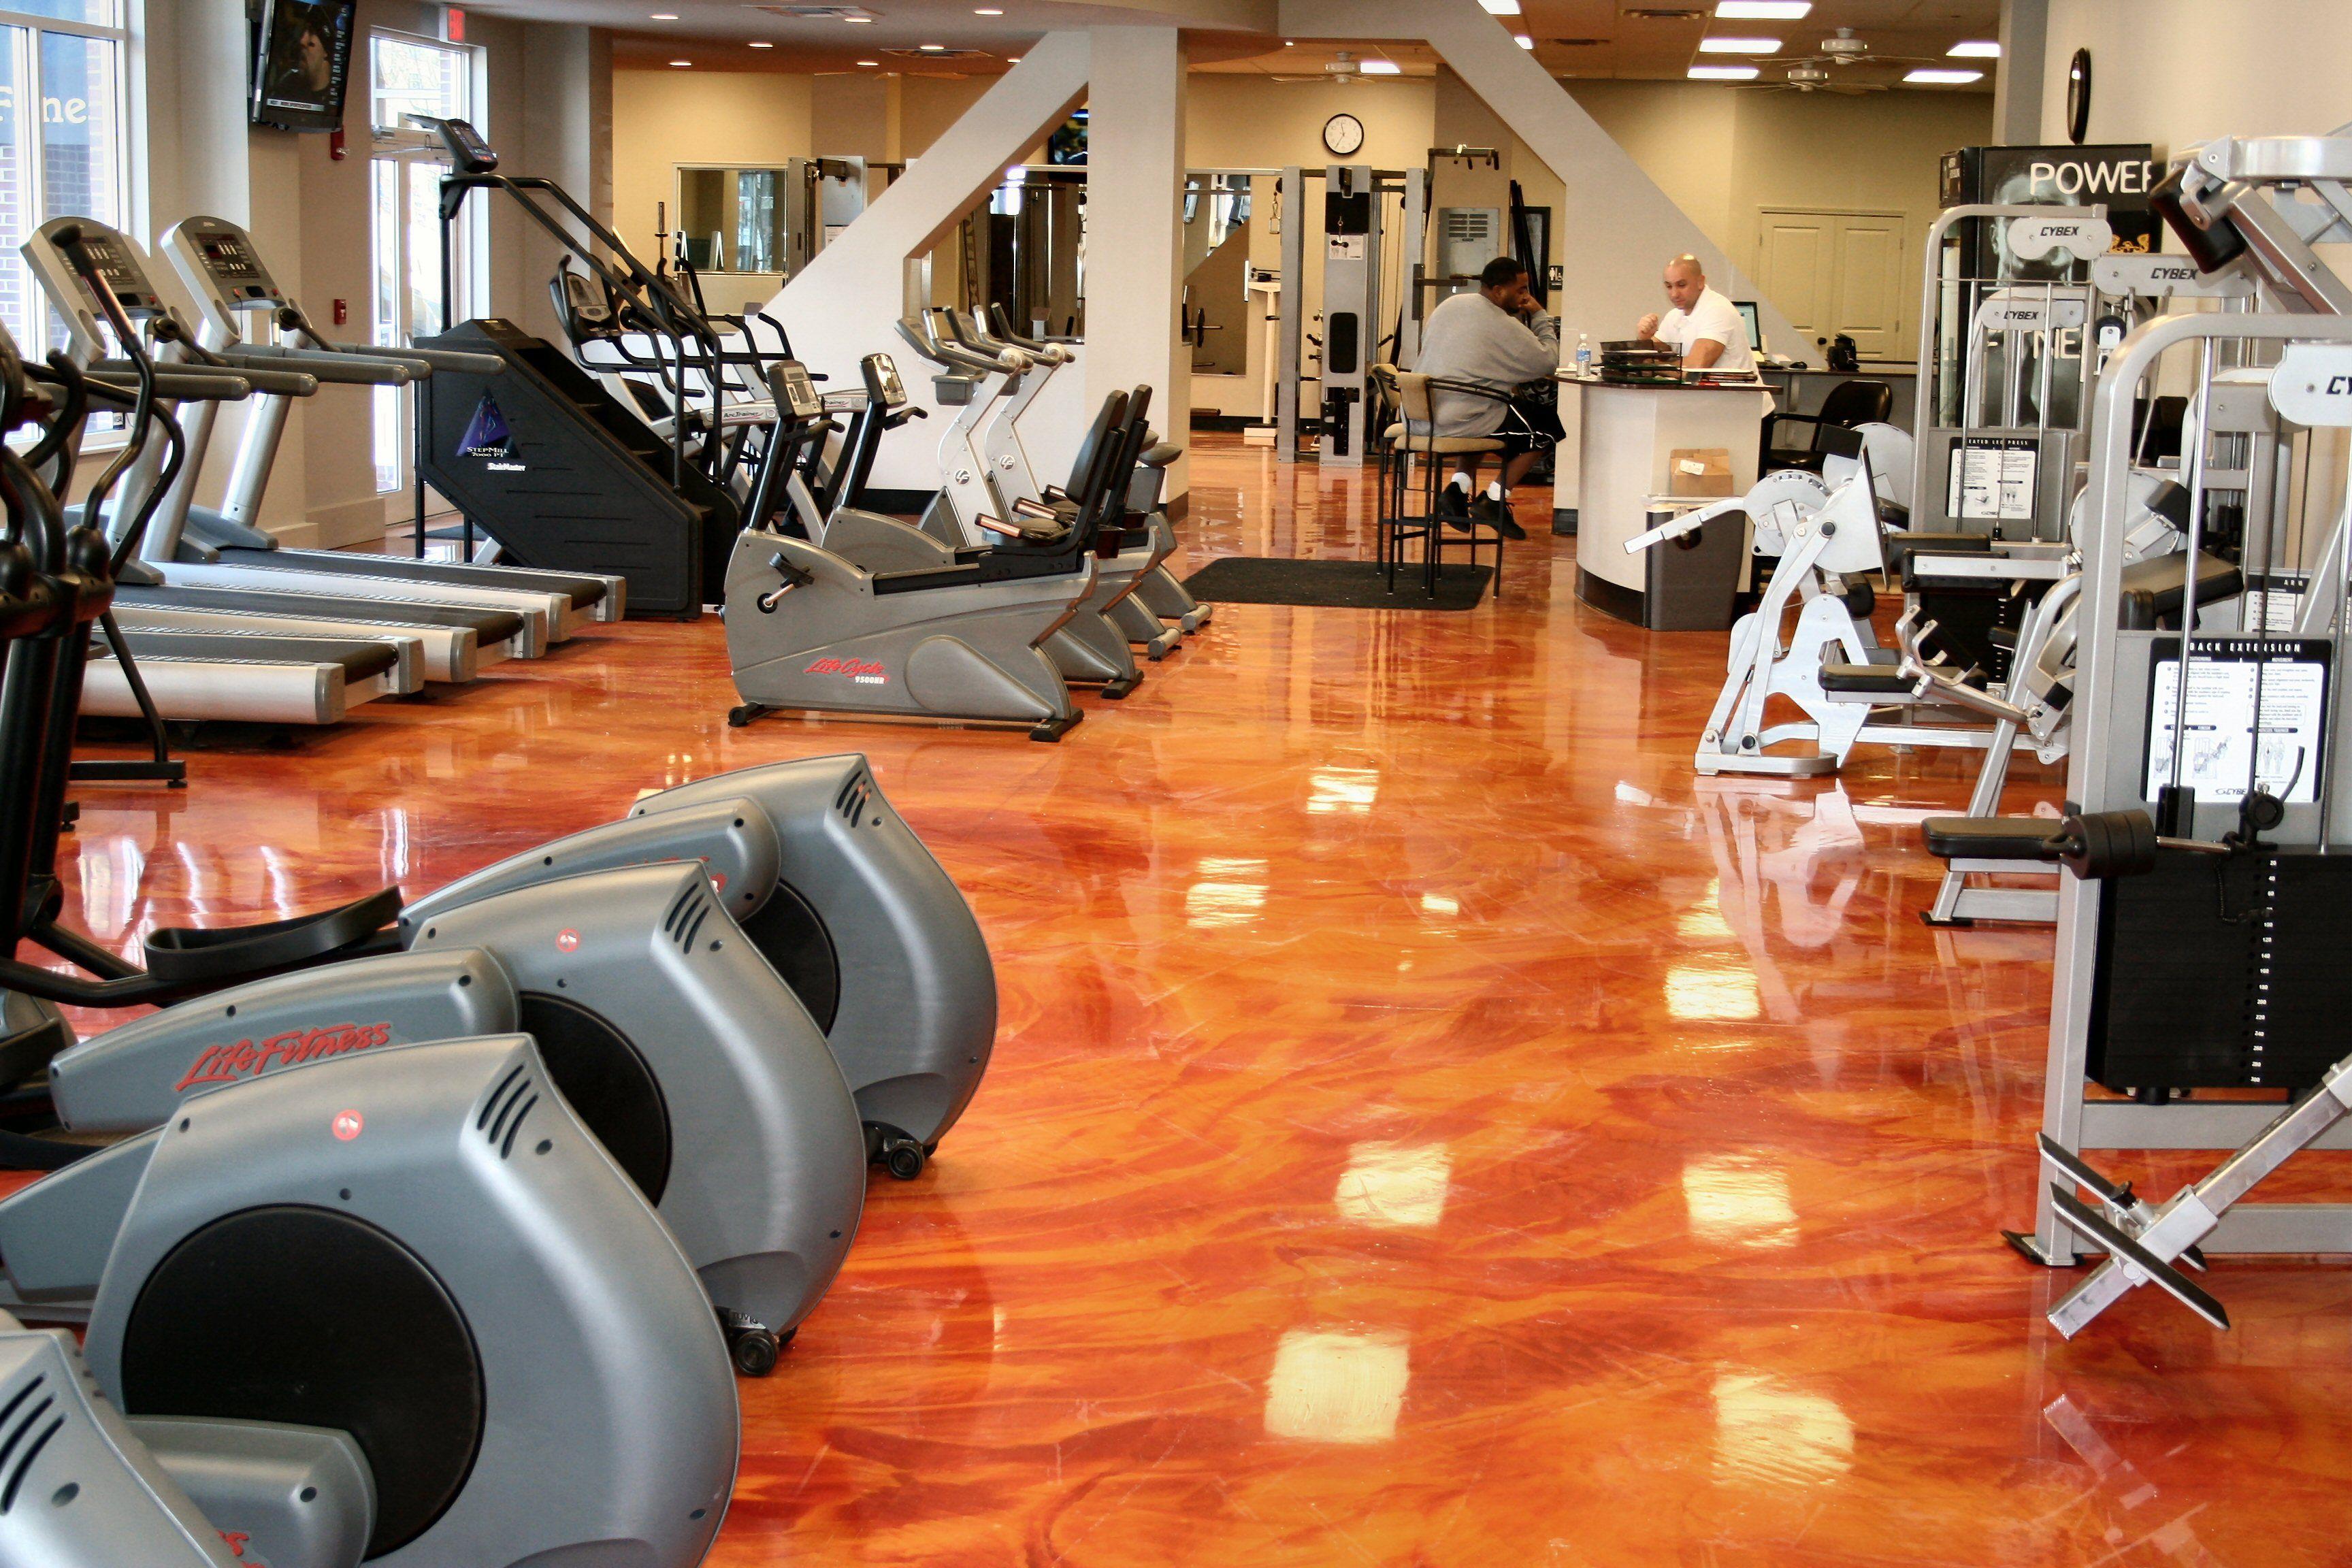 Visit Www Floorskinz Com For More Information Metallic Epoxy Gym Floor Gym Flooring Concrete Floors Flooring